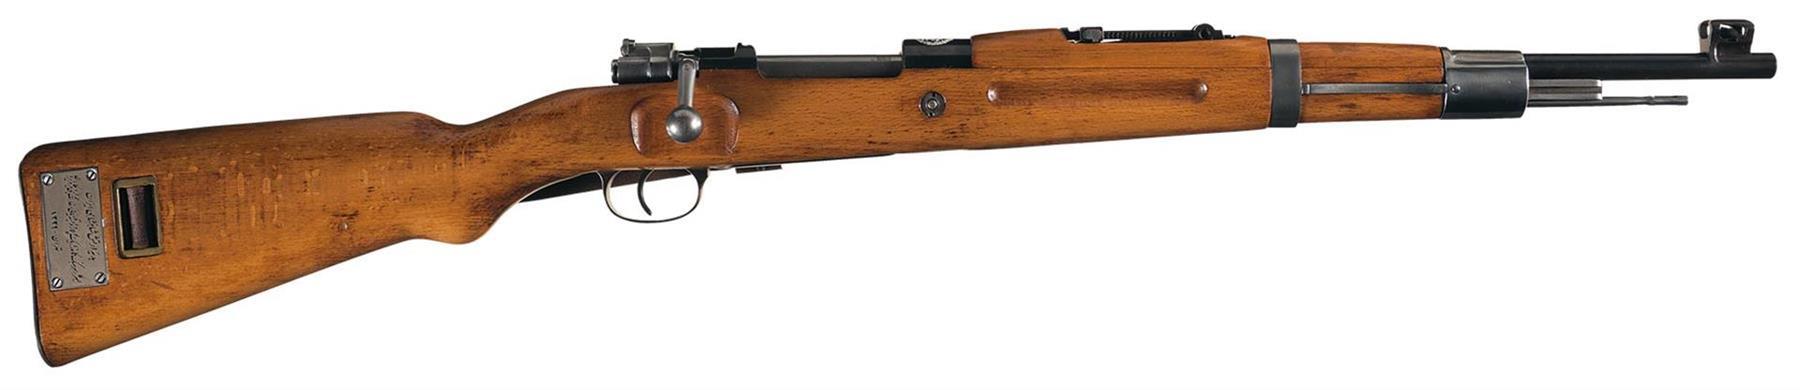 M 49 Persian Mauser IRAN (Persian) - 49-Ca...